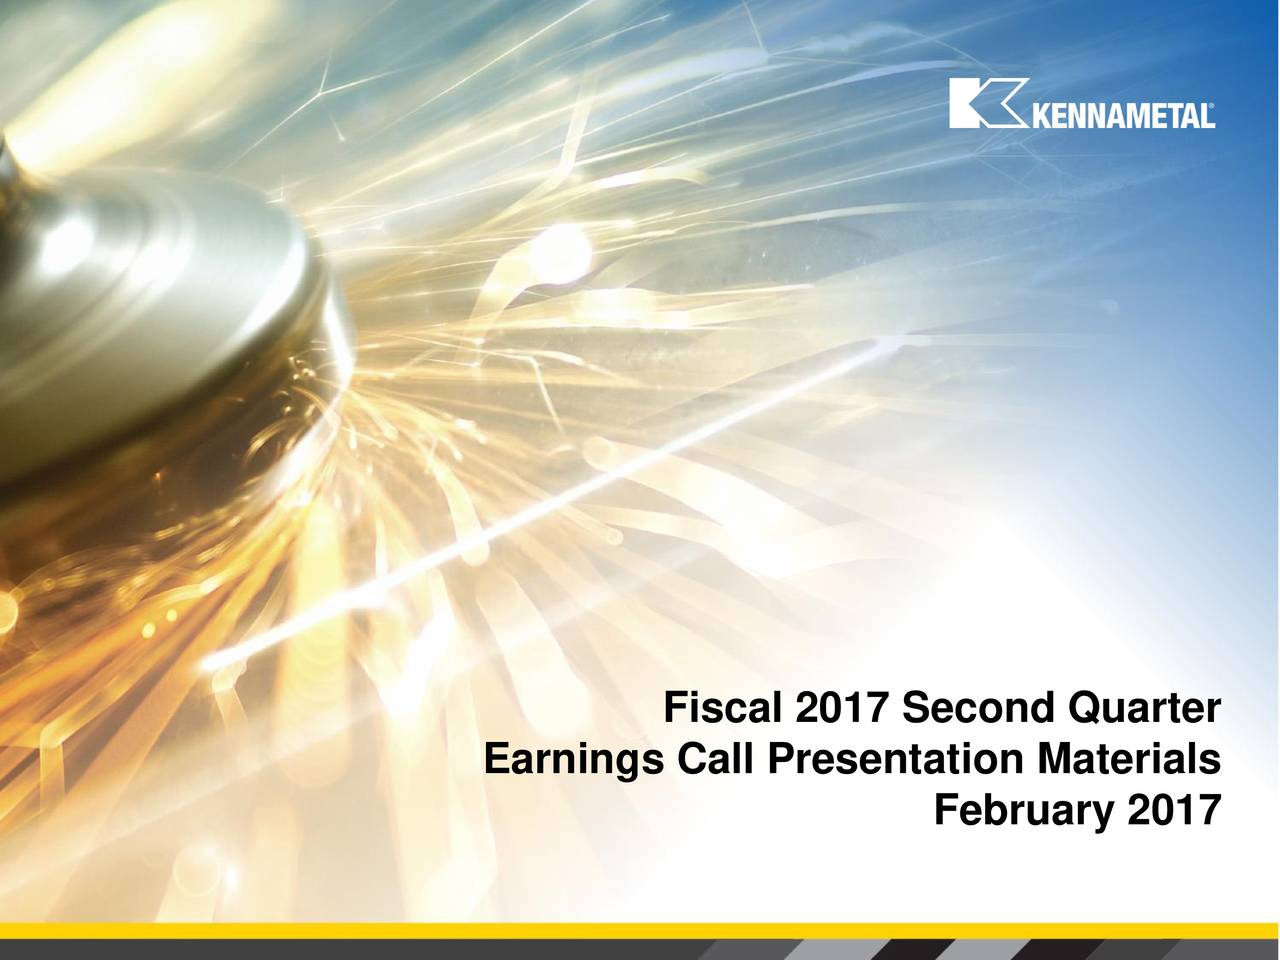 Earnings Call Presentation Materials February 2017